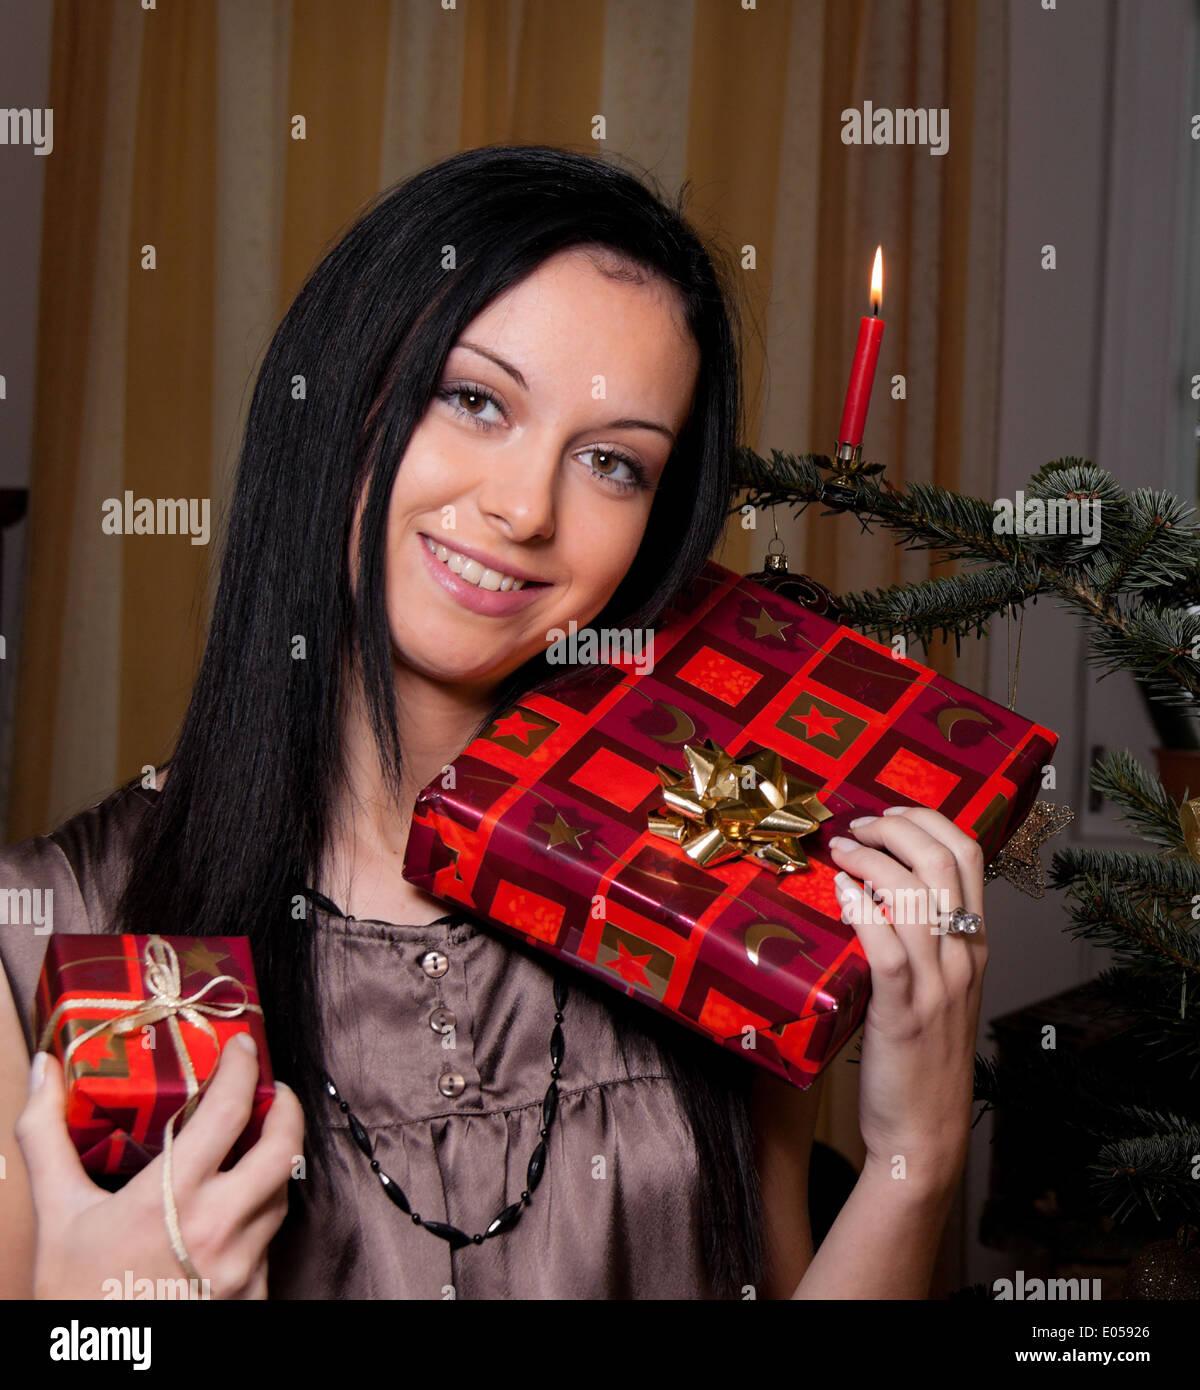 Mulher jovem com presentes de Natal, Junge Frau mit Weihnachtsgeschenken Imagens de Stock